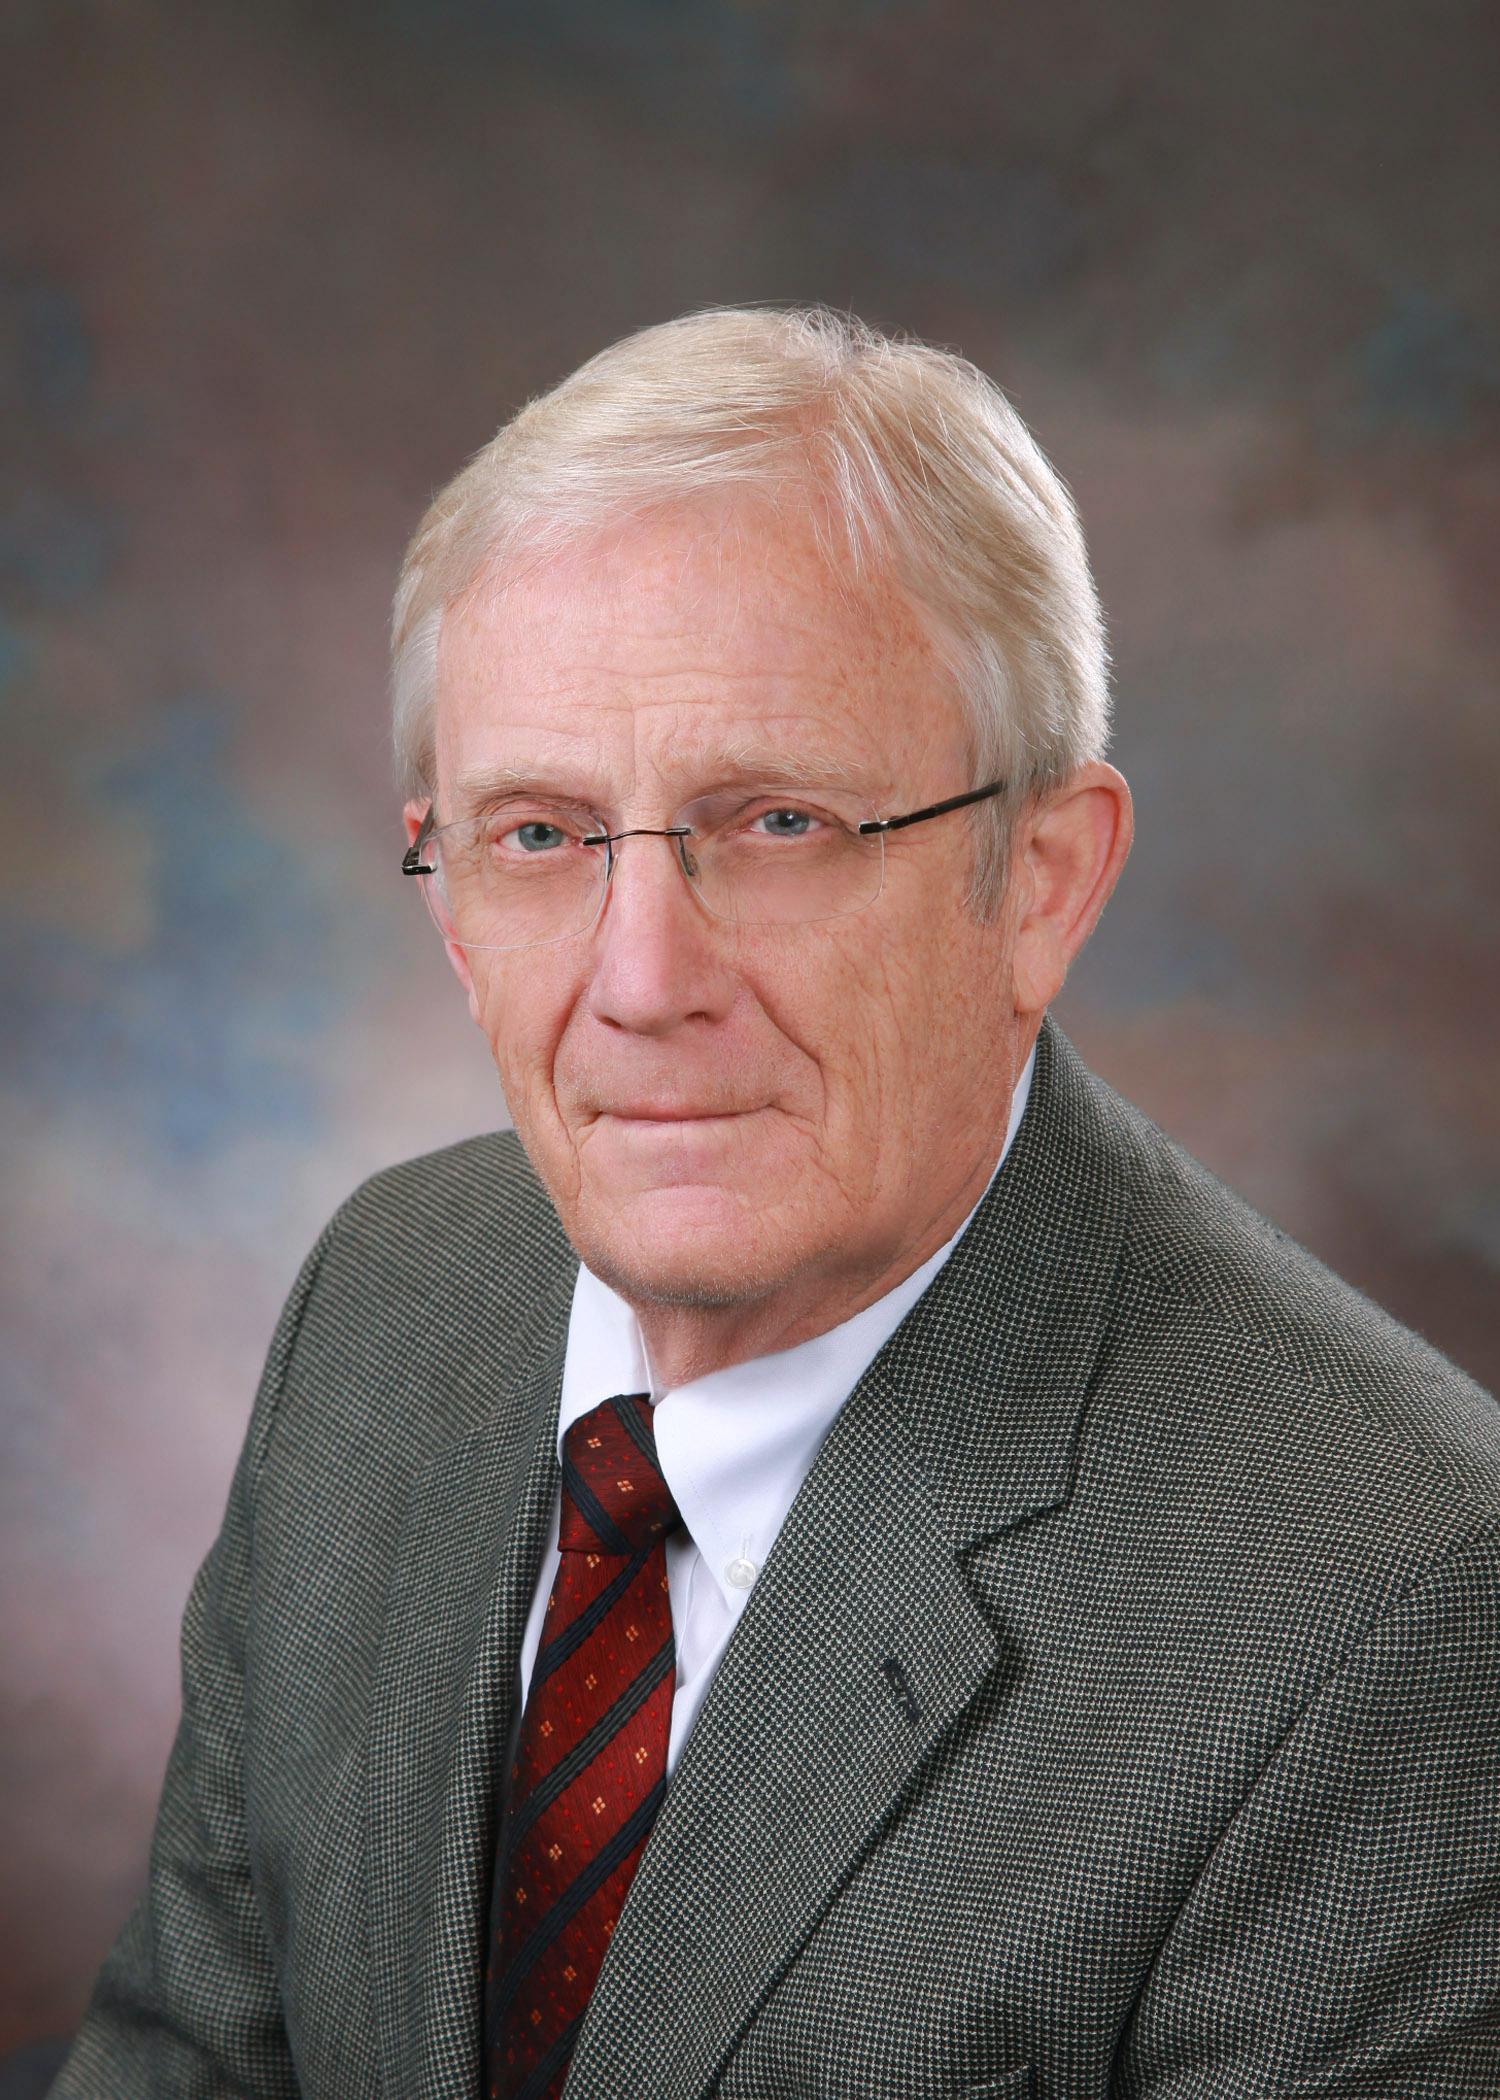 Lawrence Harrop